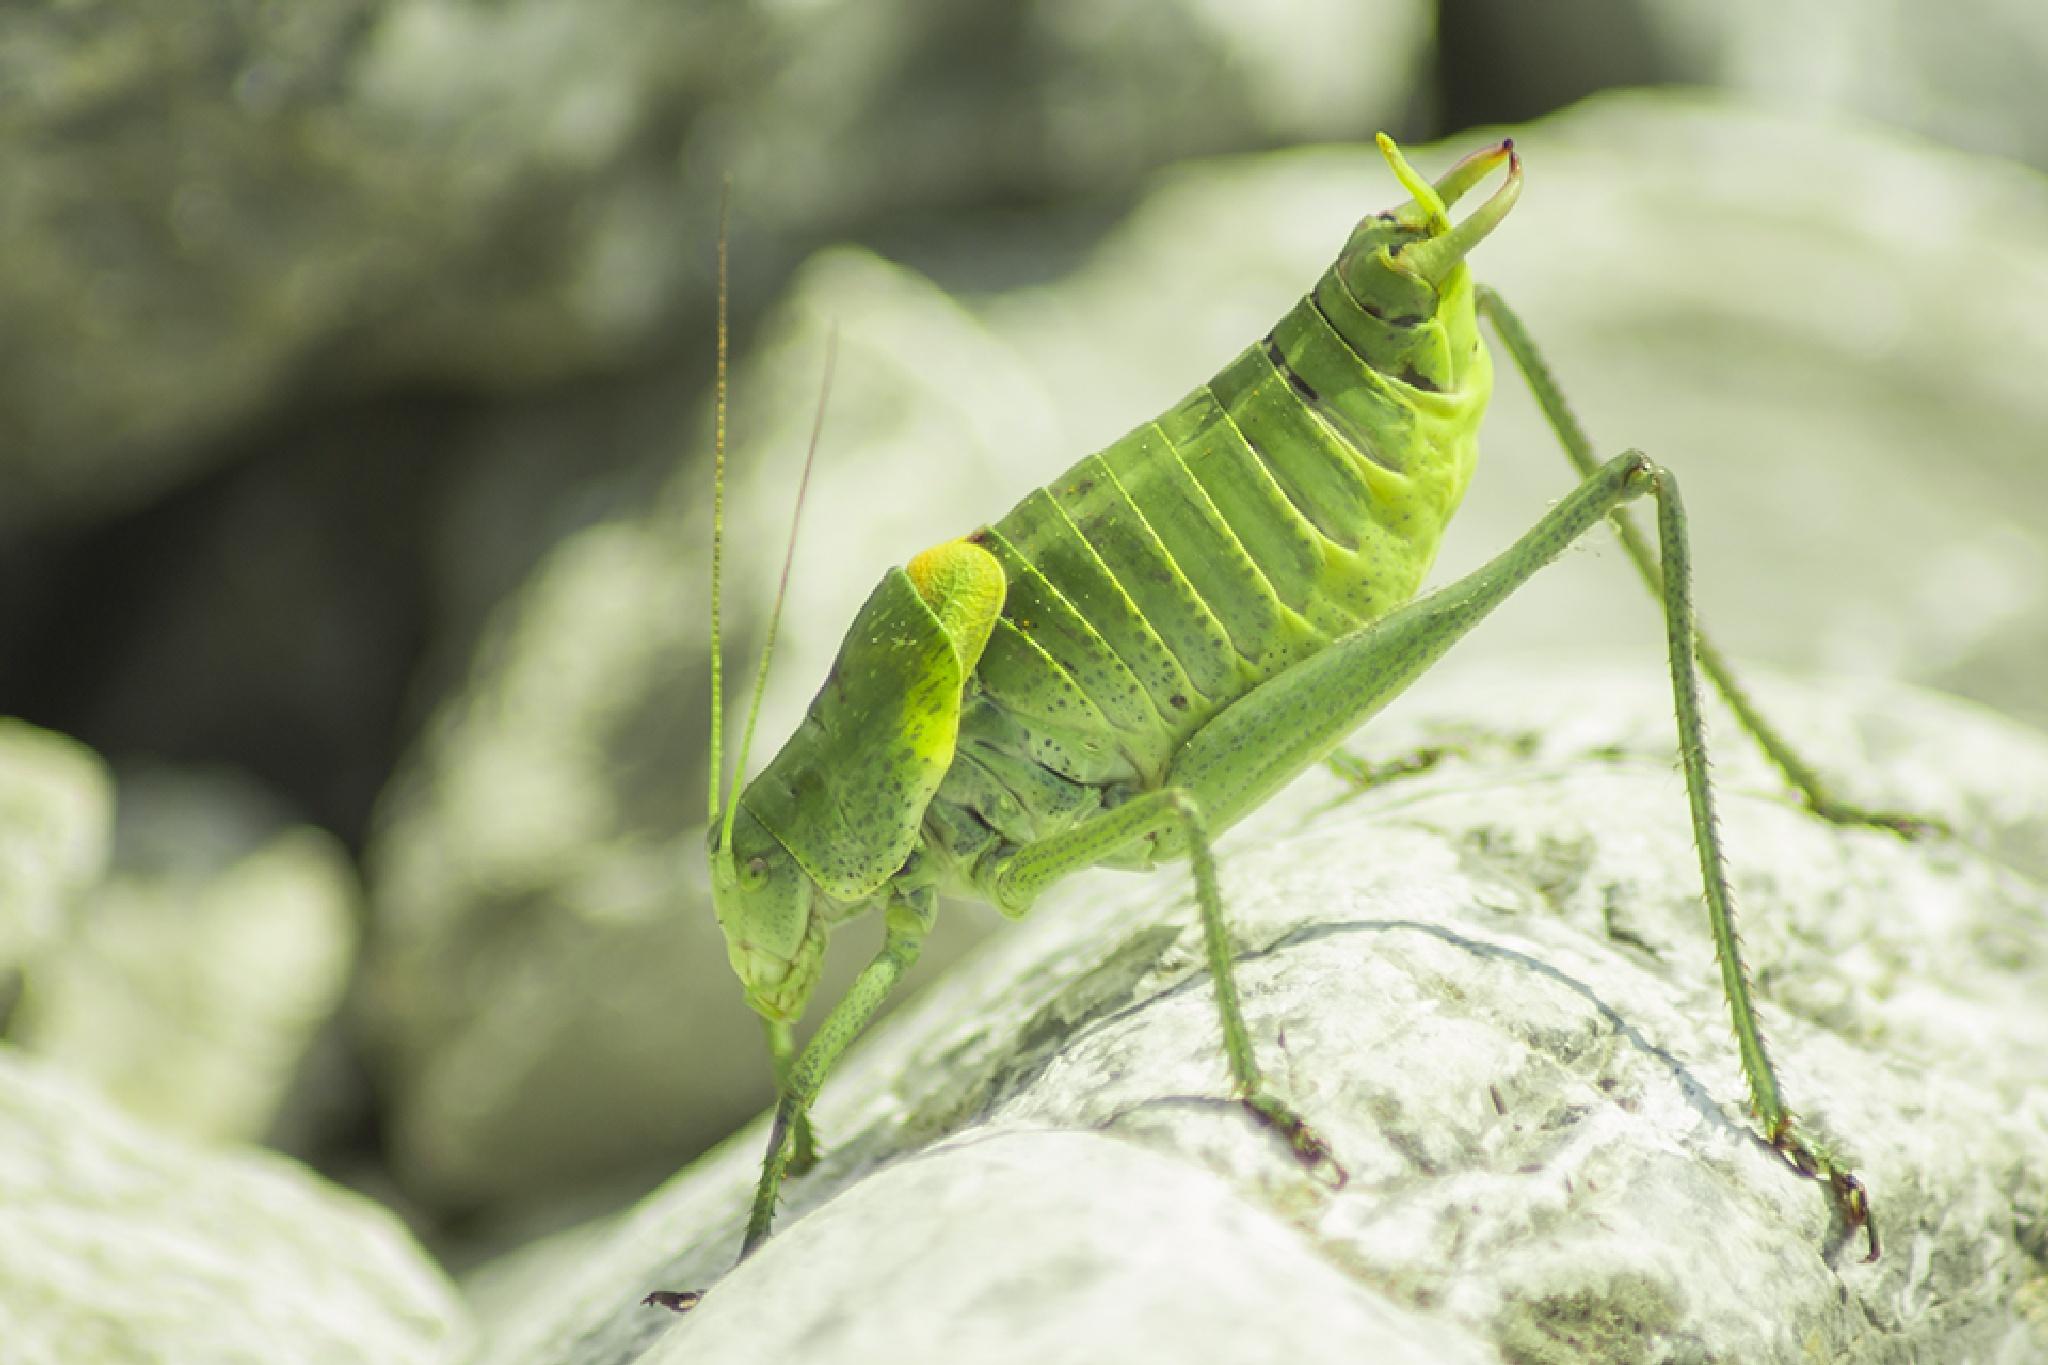 Grasshopper by mugurelcm